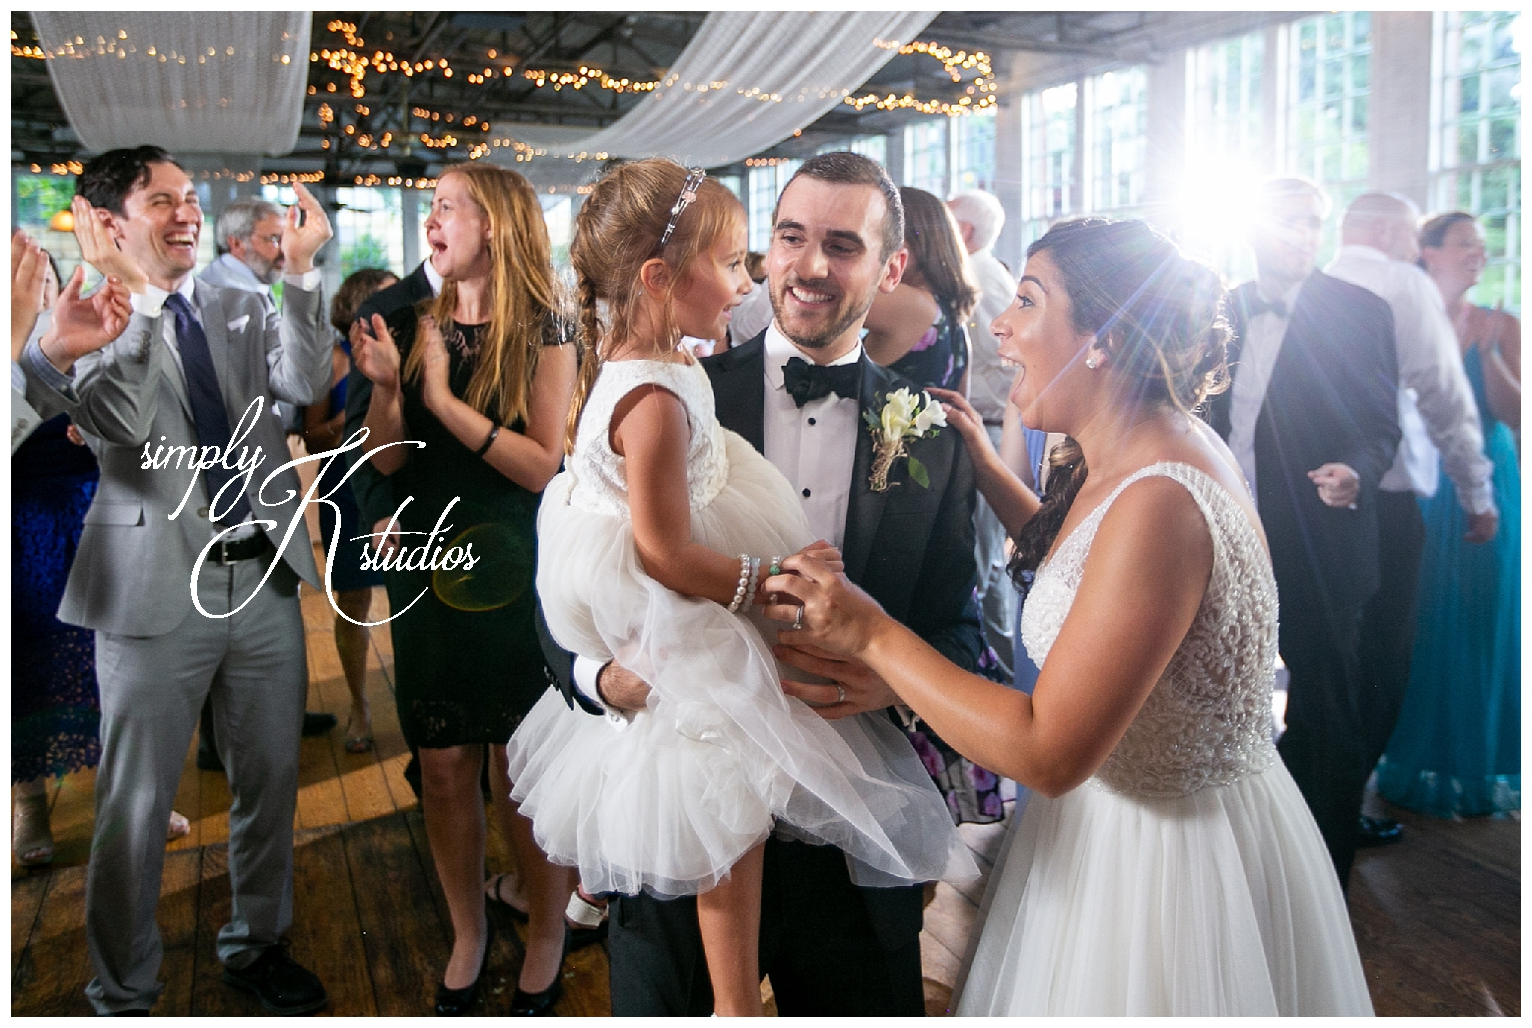 Flower Girl at a Wedding.jpg